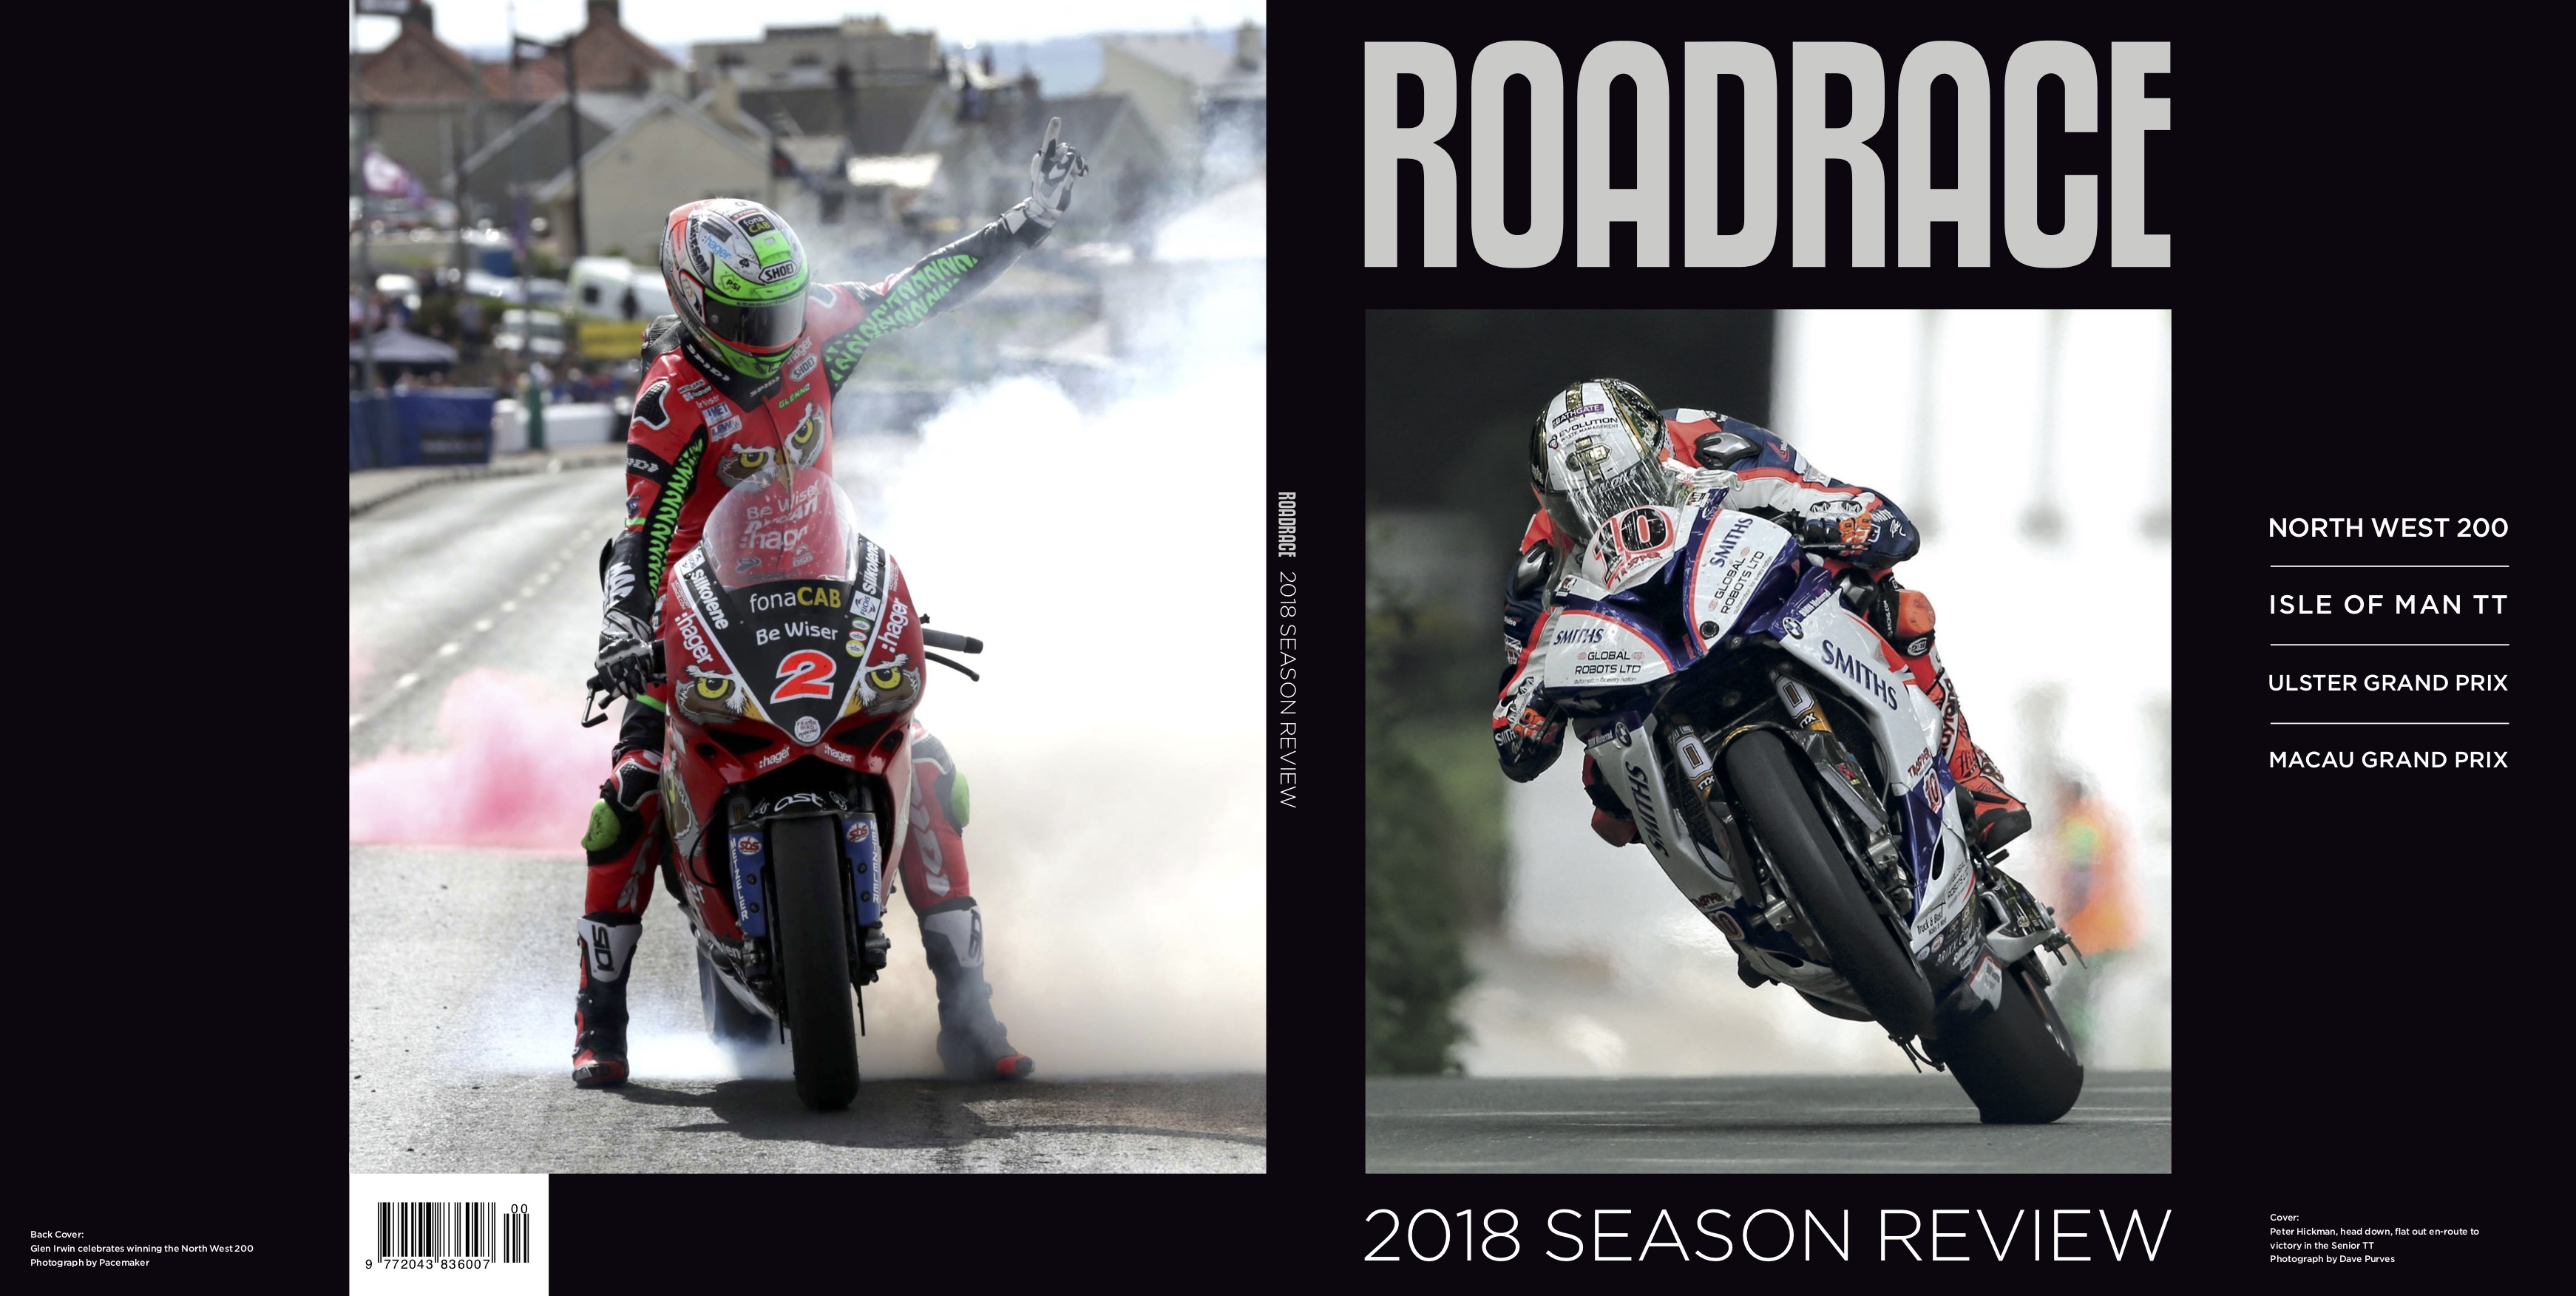 2018 Roadrace Season Review Book Launched Visordown Helm Glossy Racing Spirit White Blue